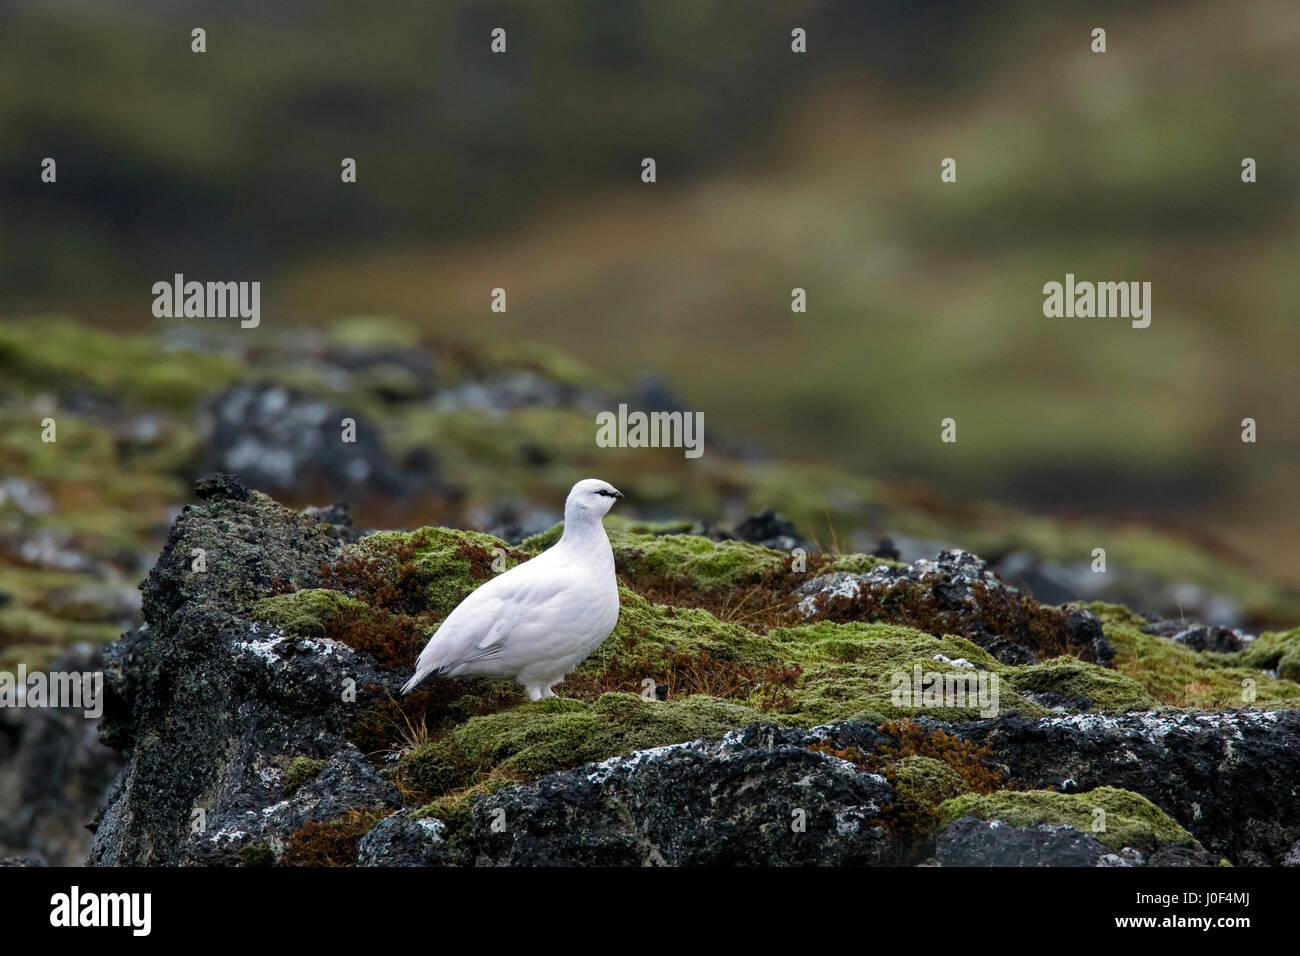 Rock ptarmigan (Lagopus muta / Lagopus mutus) female in winter plumage - Stock Image